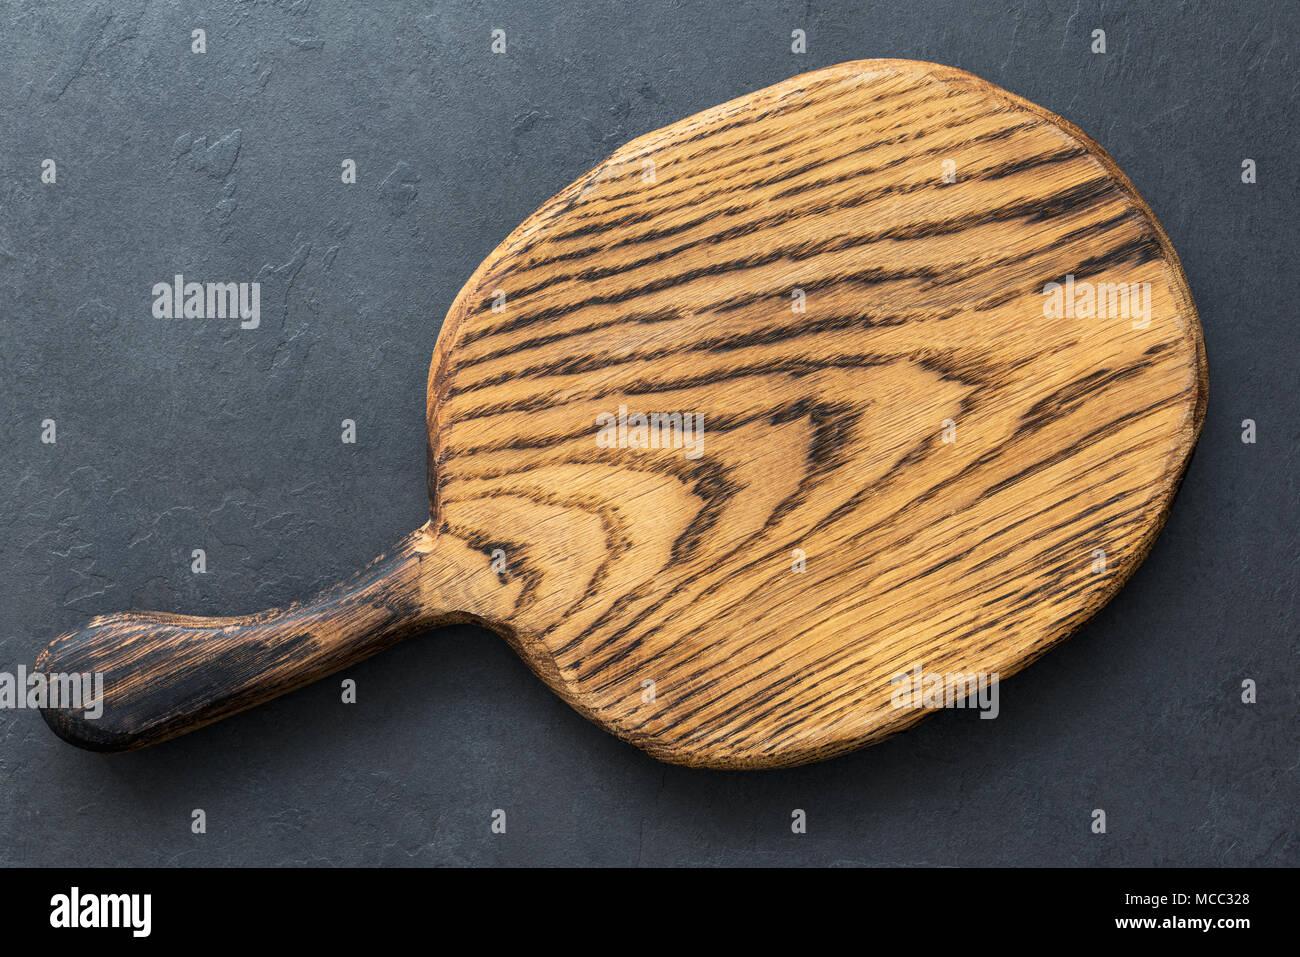 Tabla de cortar de madera sobre fondo de pizarra, vista superior con espacio para copiar texto. Composición horizontal Imagen De Stock